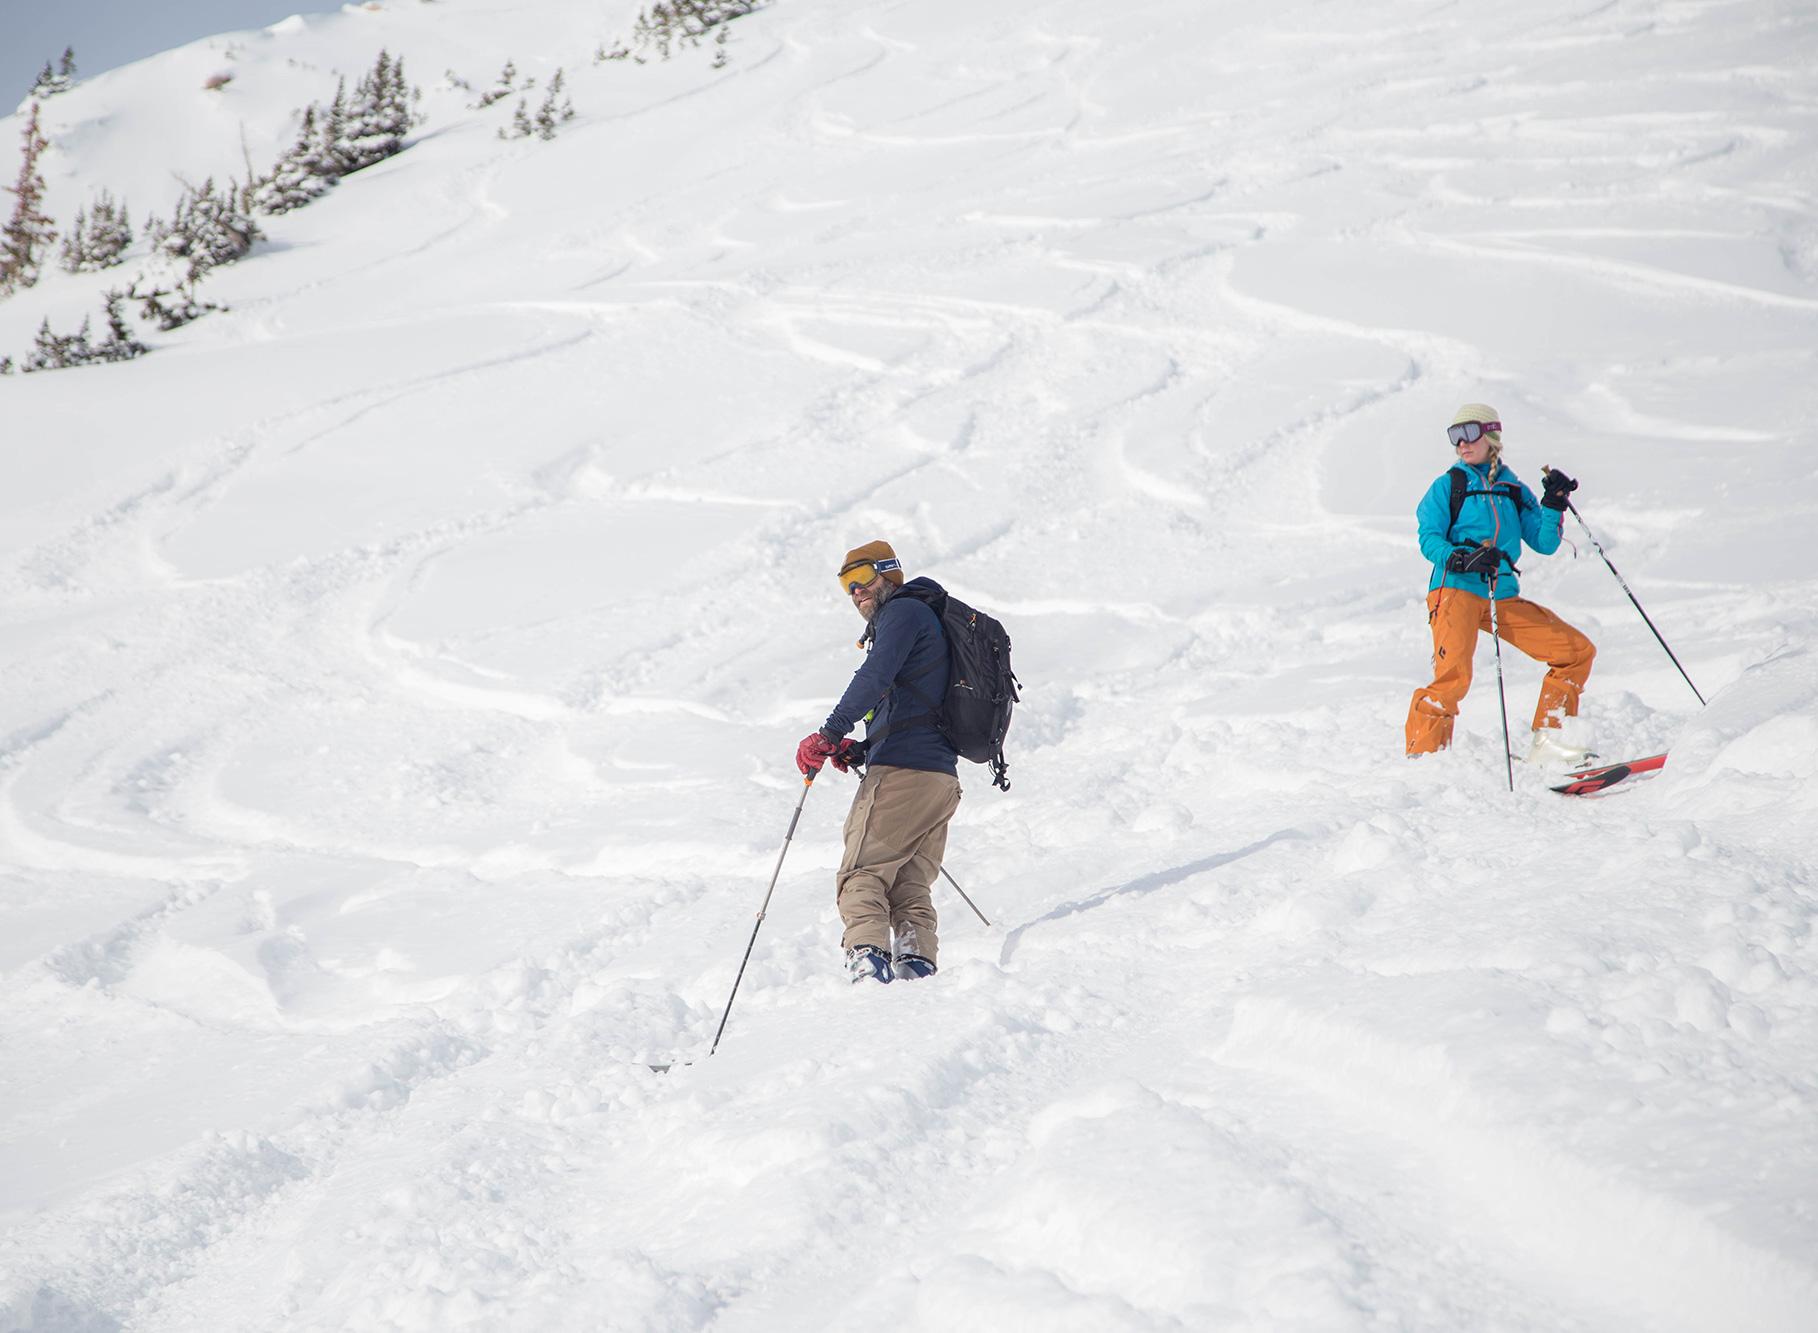 toledo-face-backcountry-skiing-utah-picture.jpg